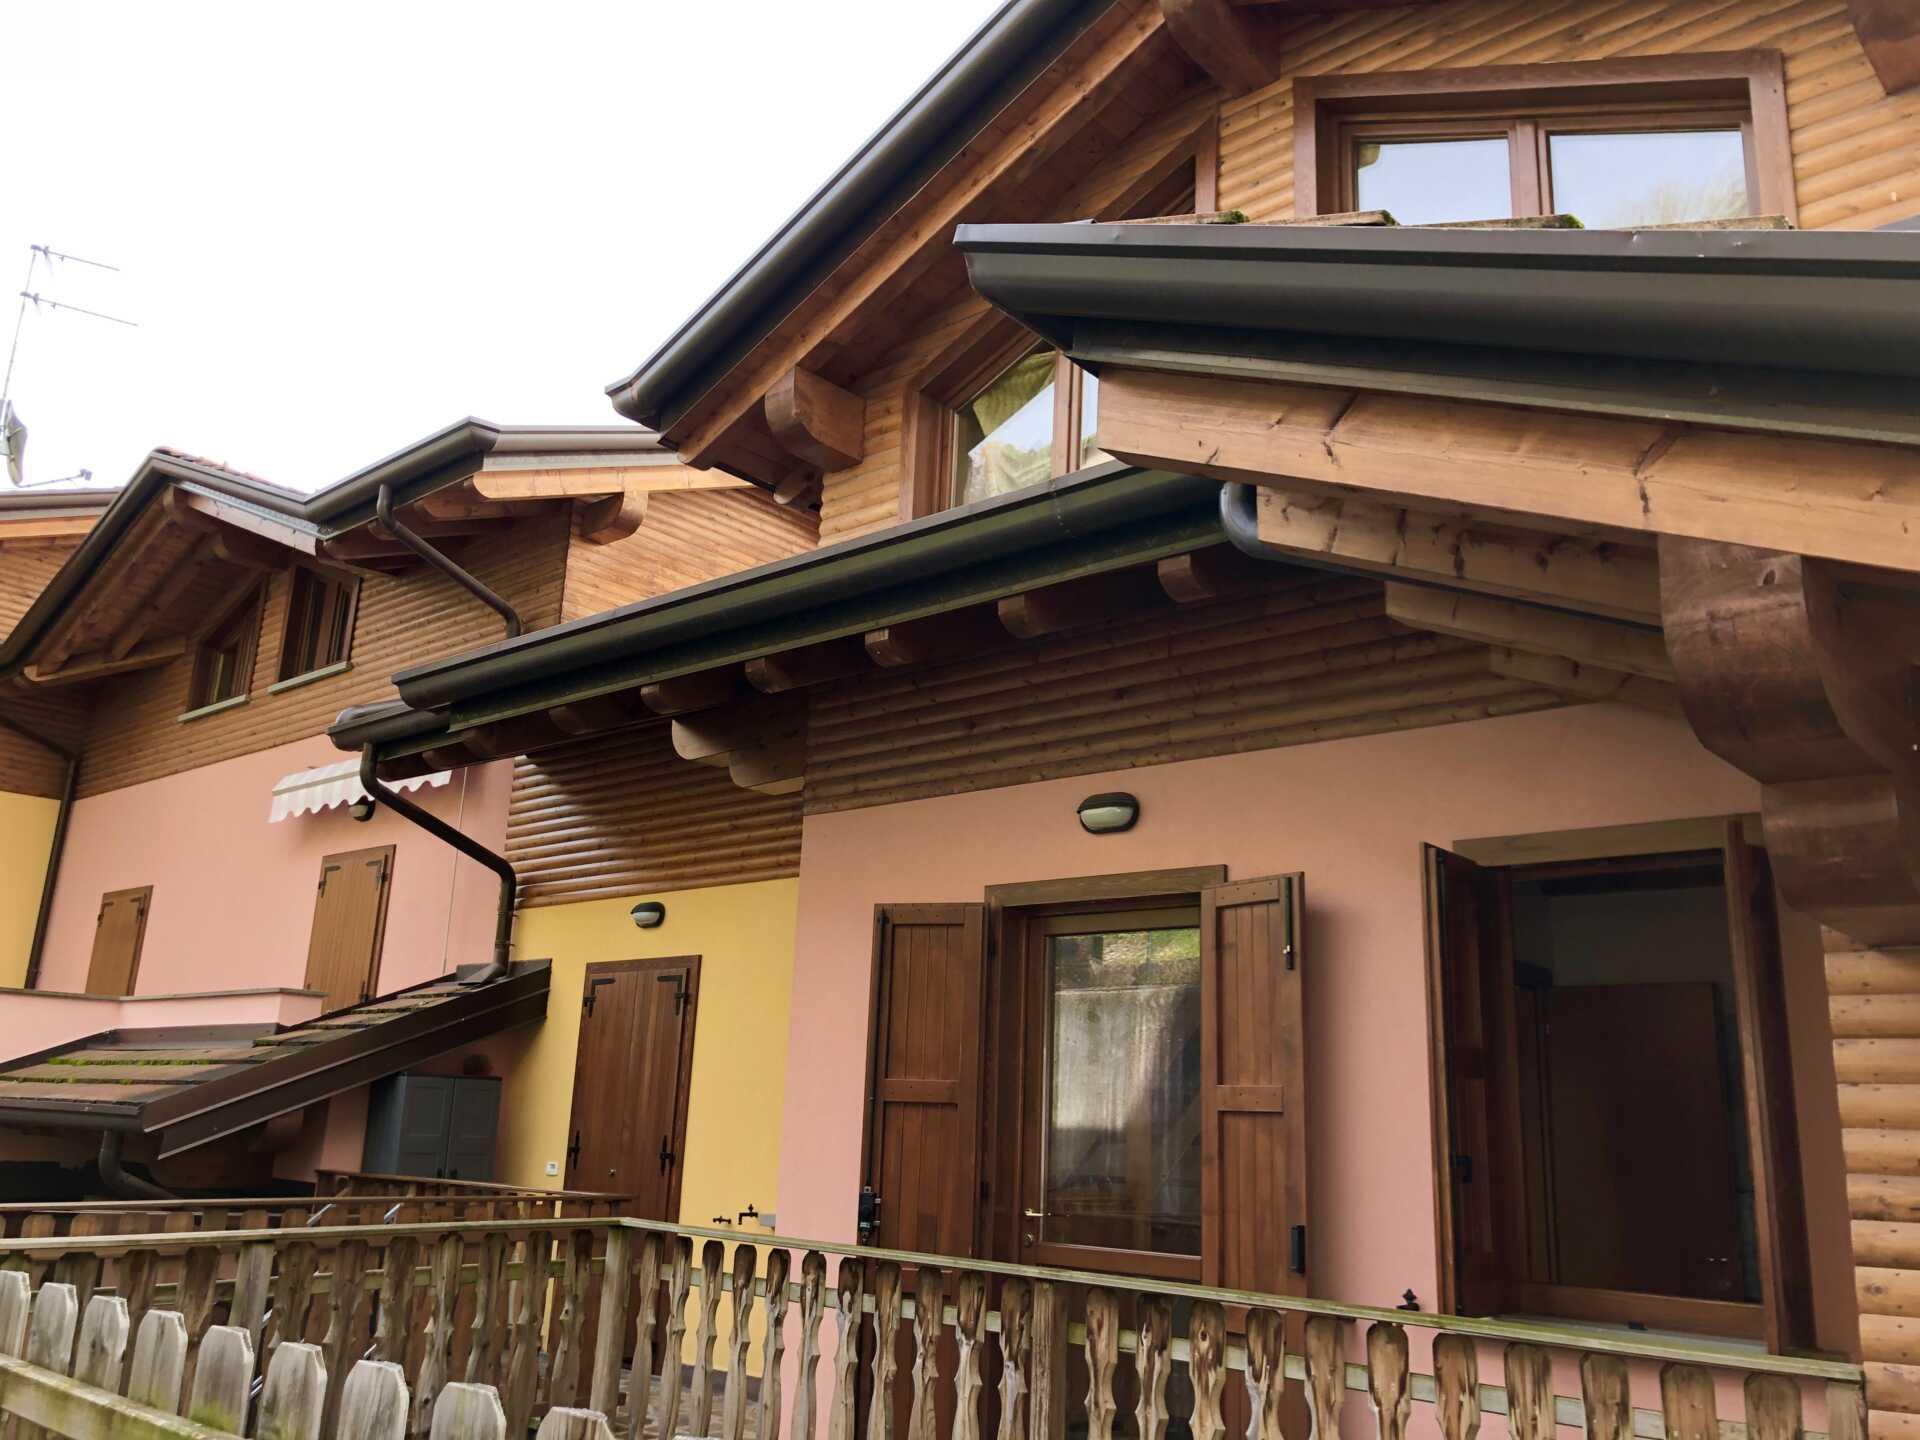 Casa-vacanze-in-vendita-appartamento-a-Dossena (18)